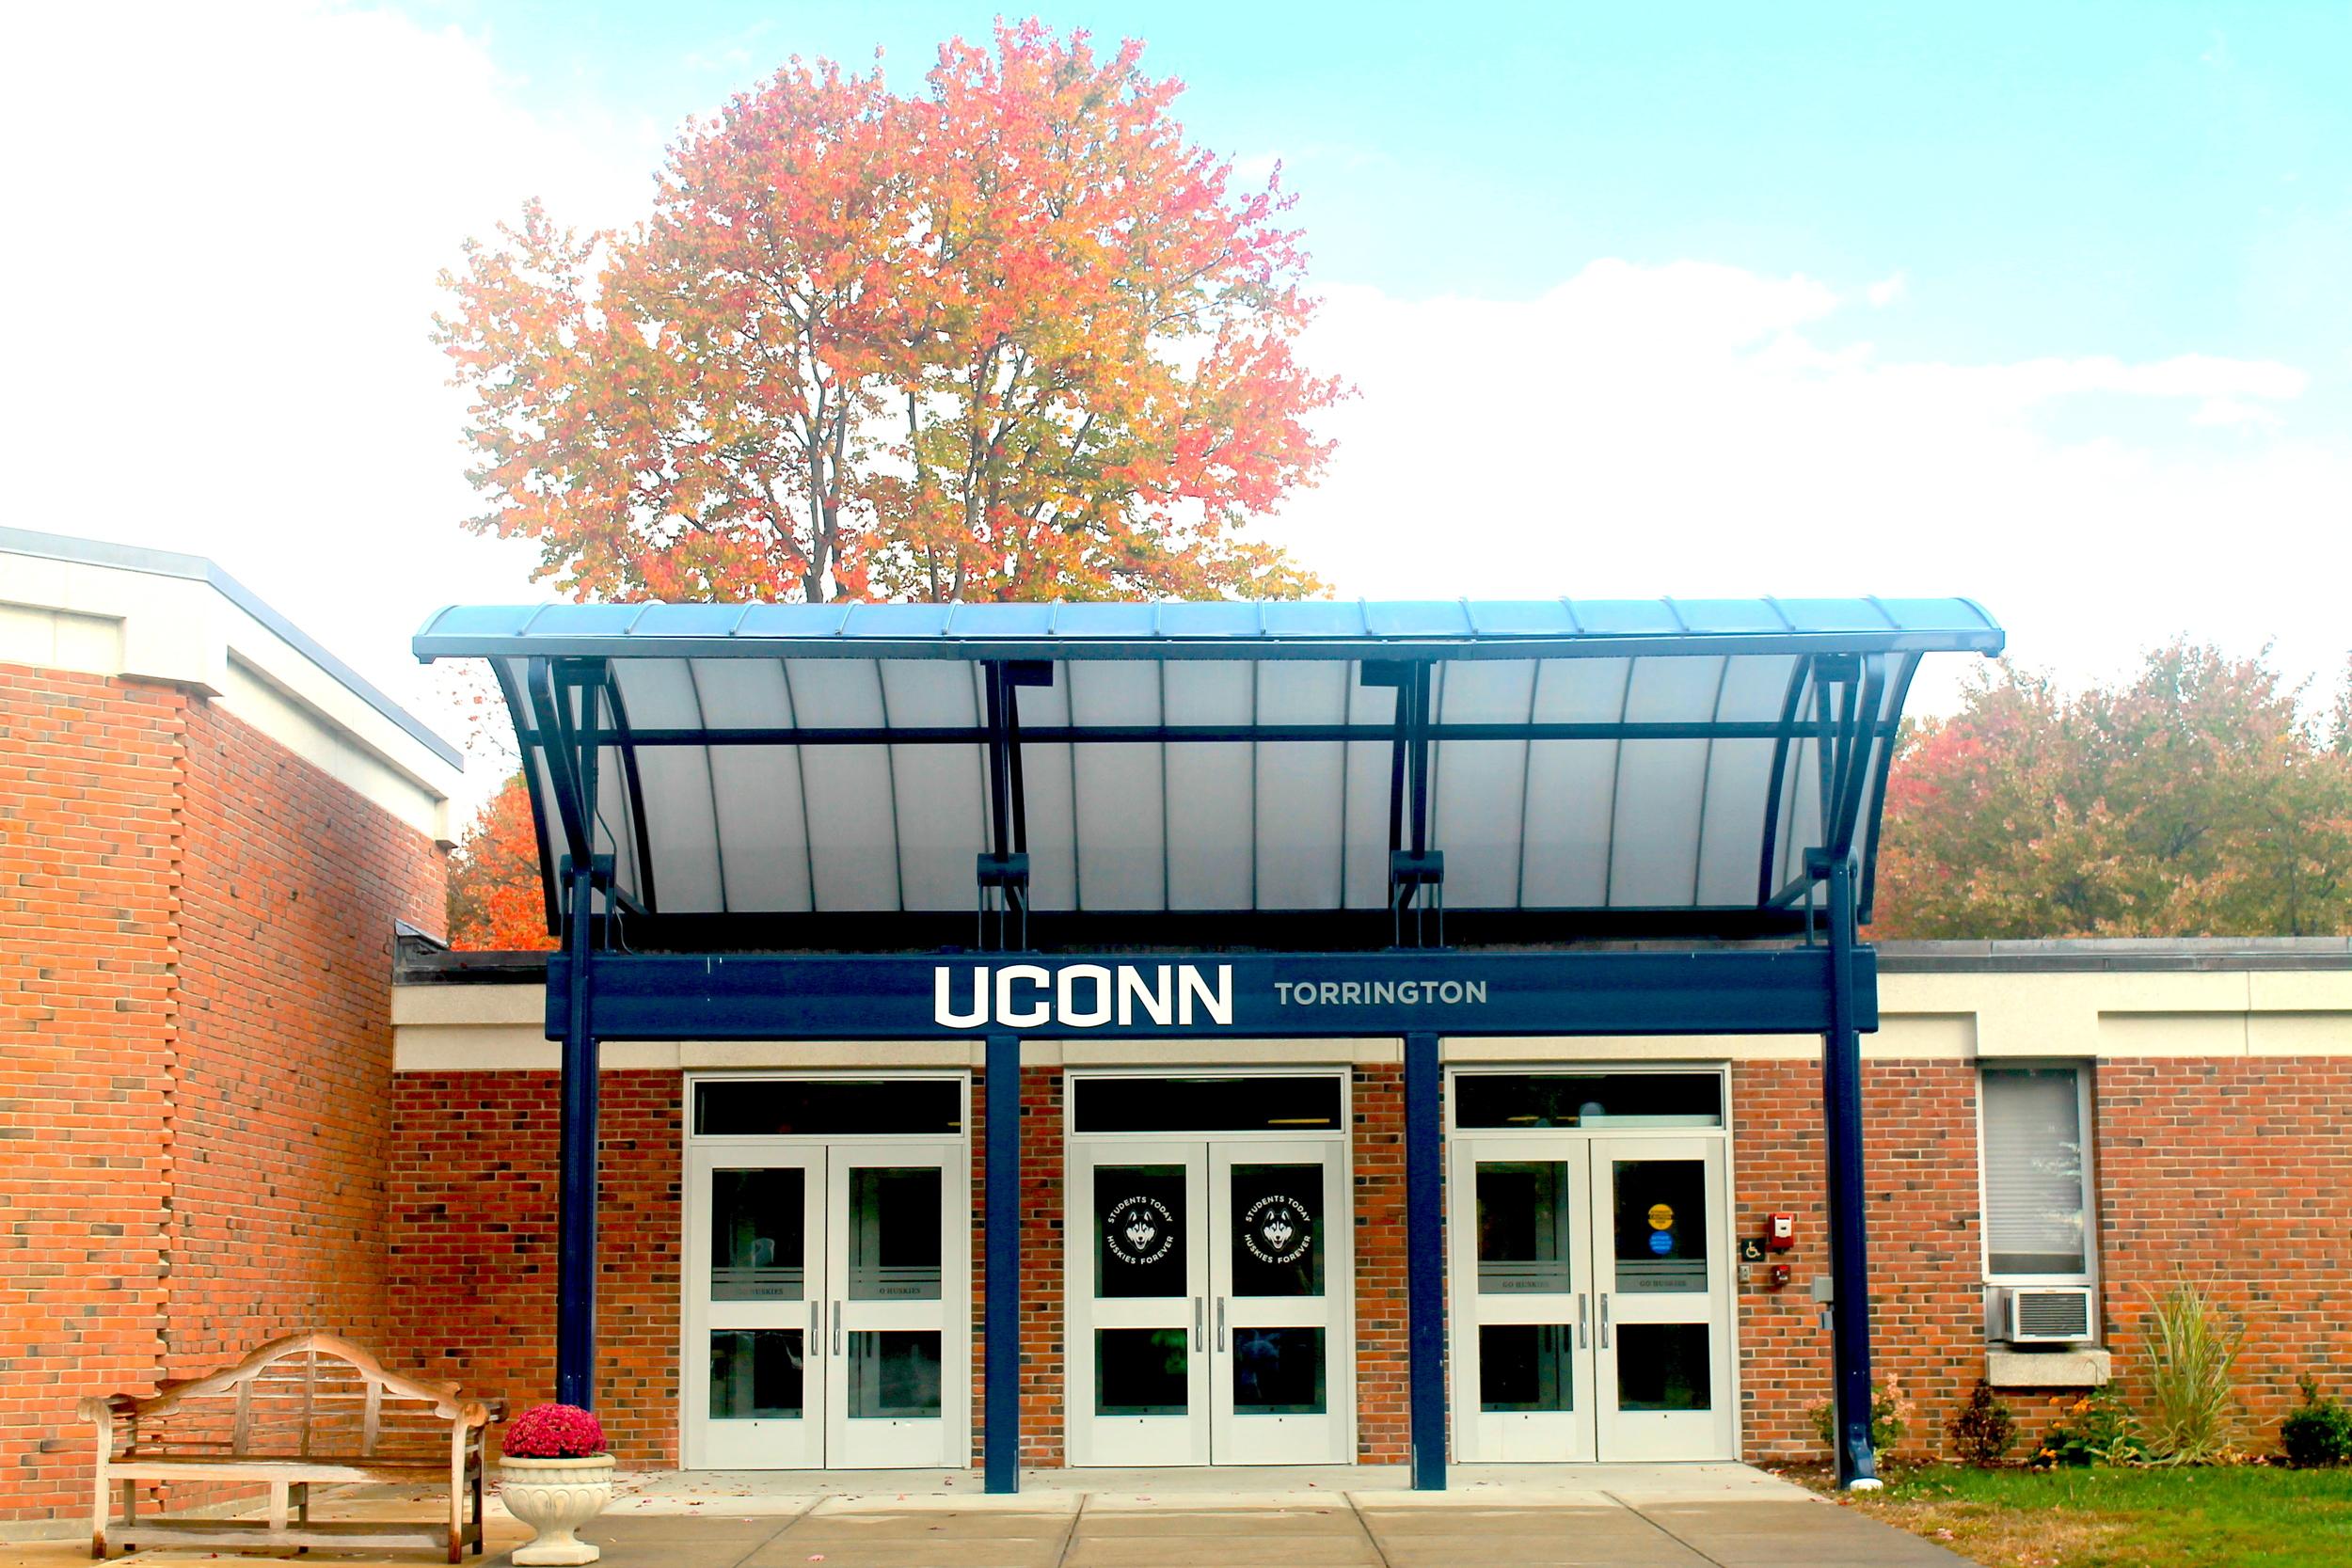 A building on UConn Torrington's campus in Torrington, Connecticut. (UConn Torrington)